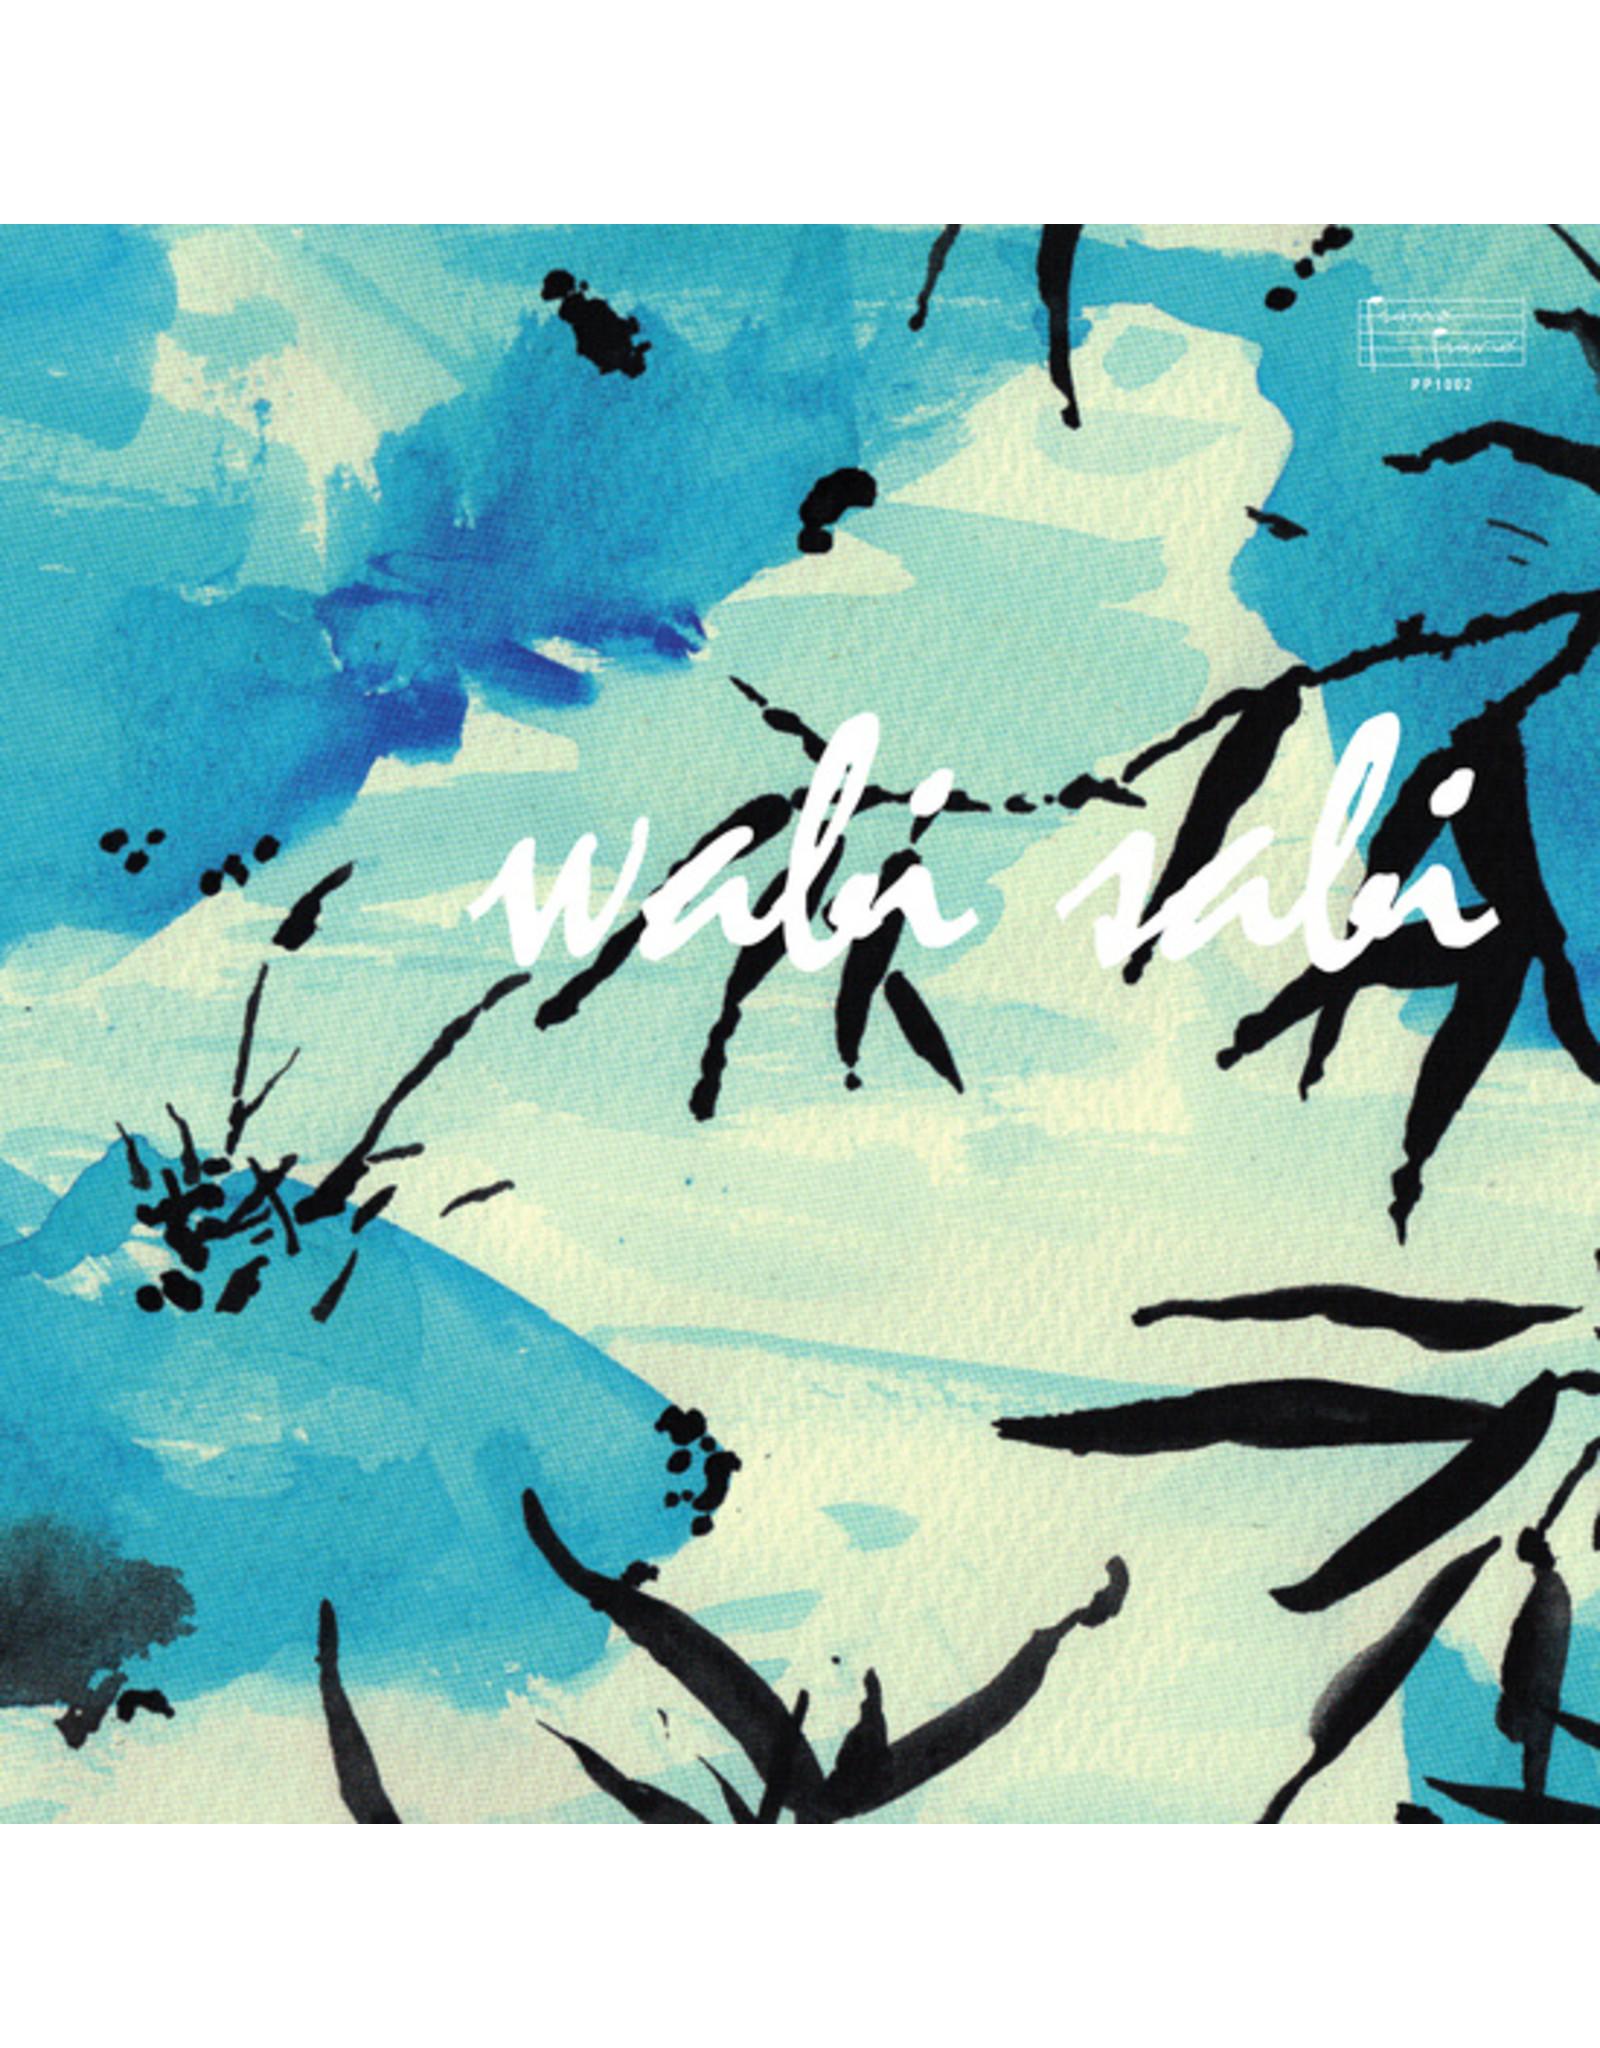 New Vinyl Sven Wunder - Wabi Sabi LP